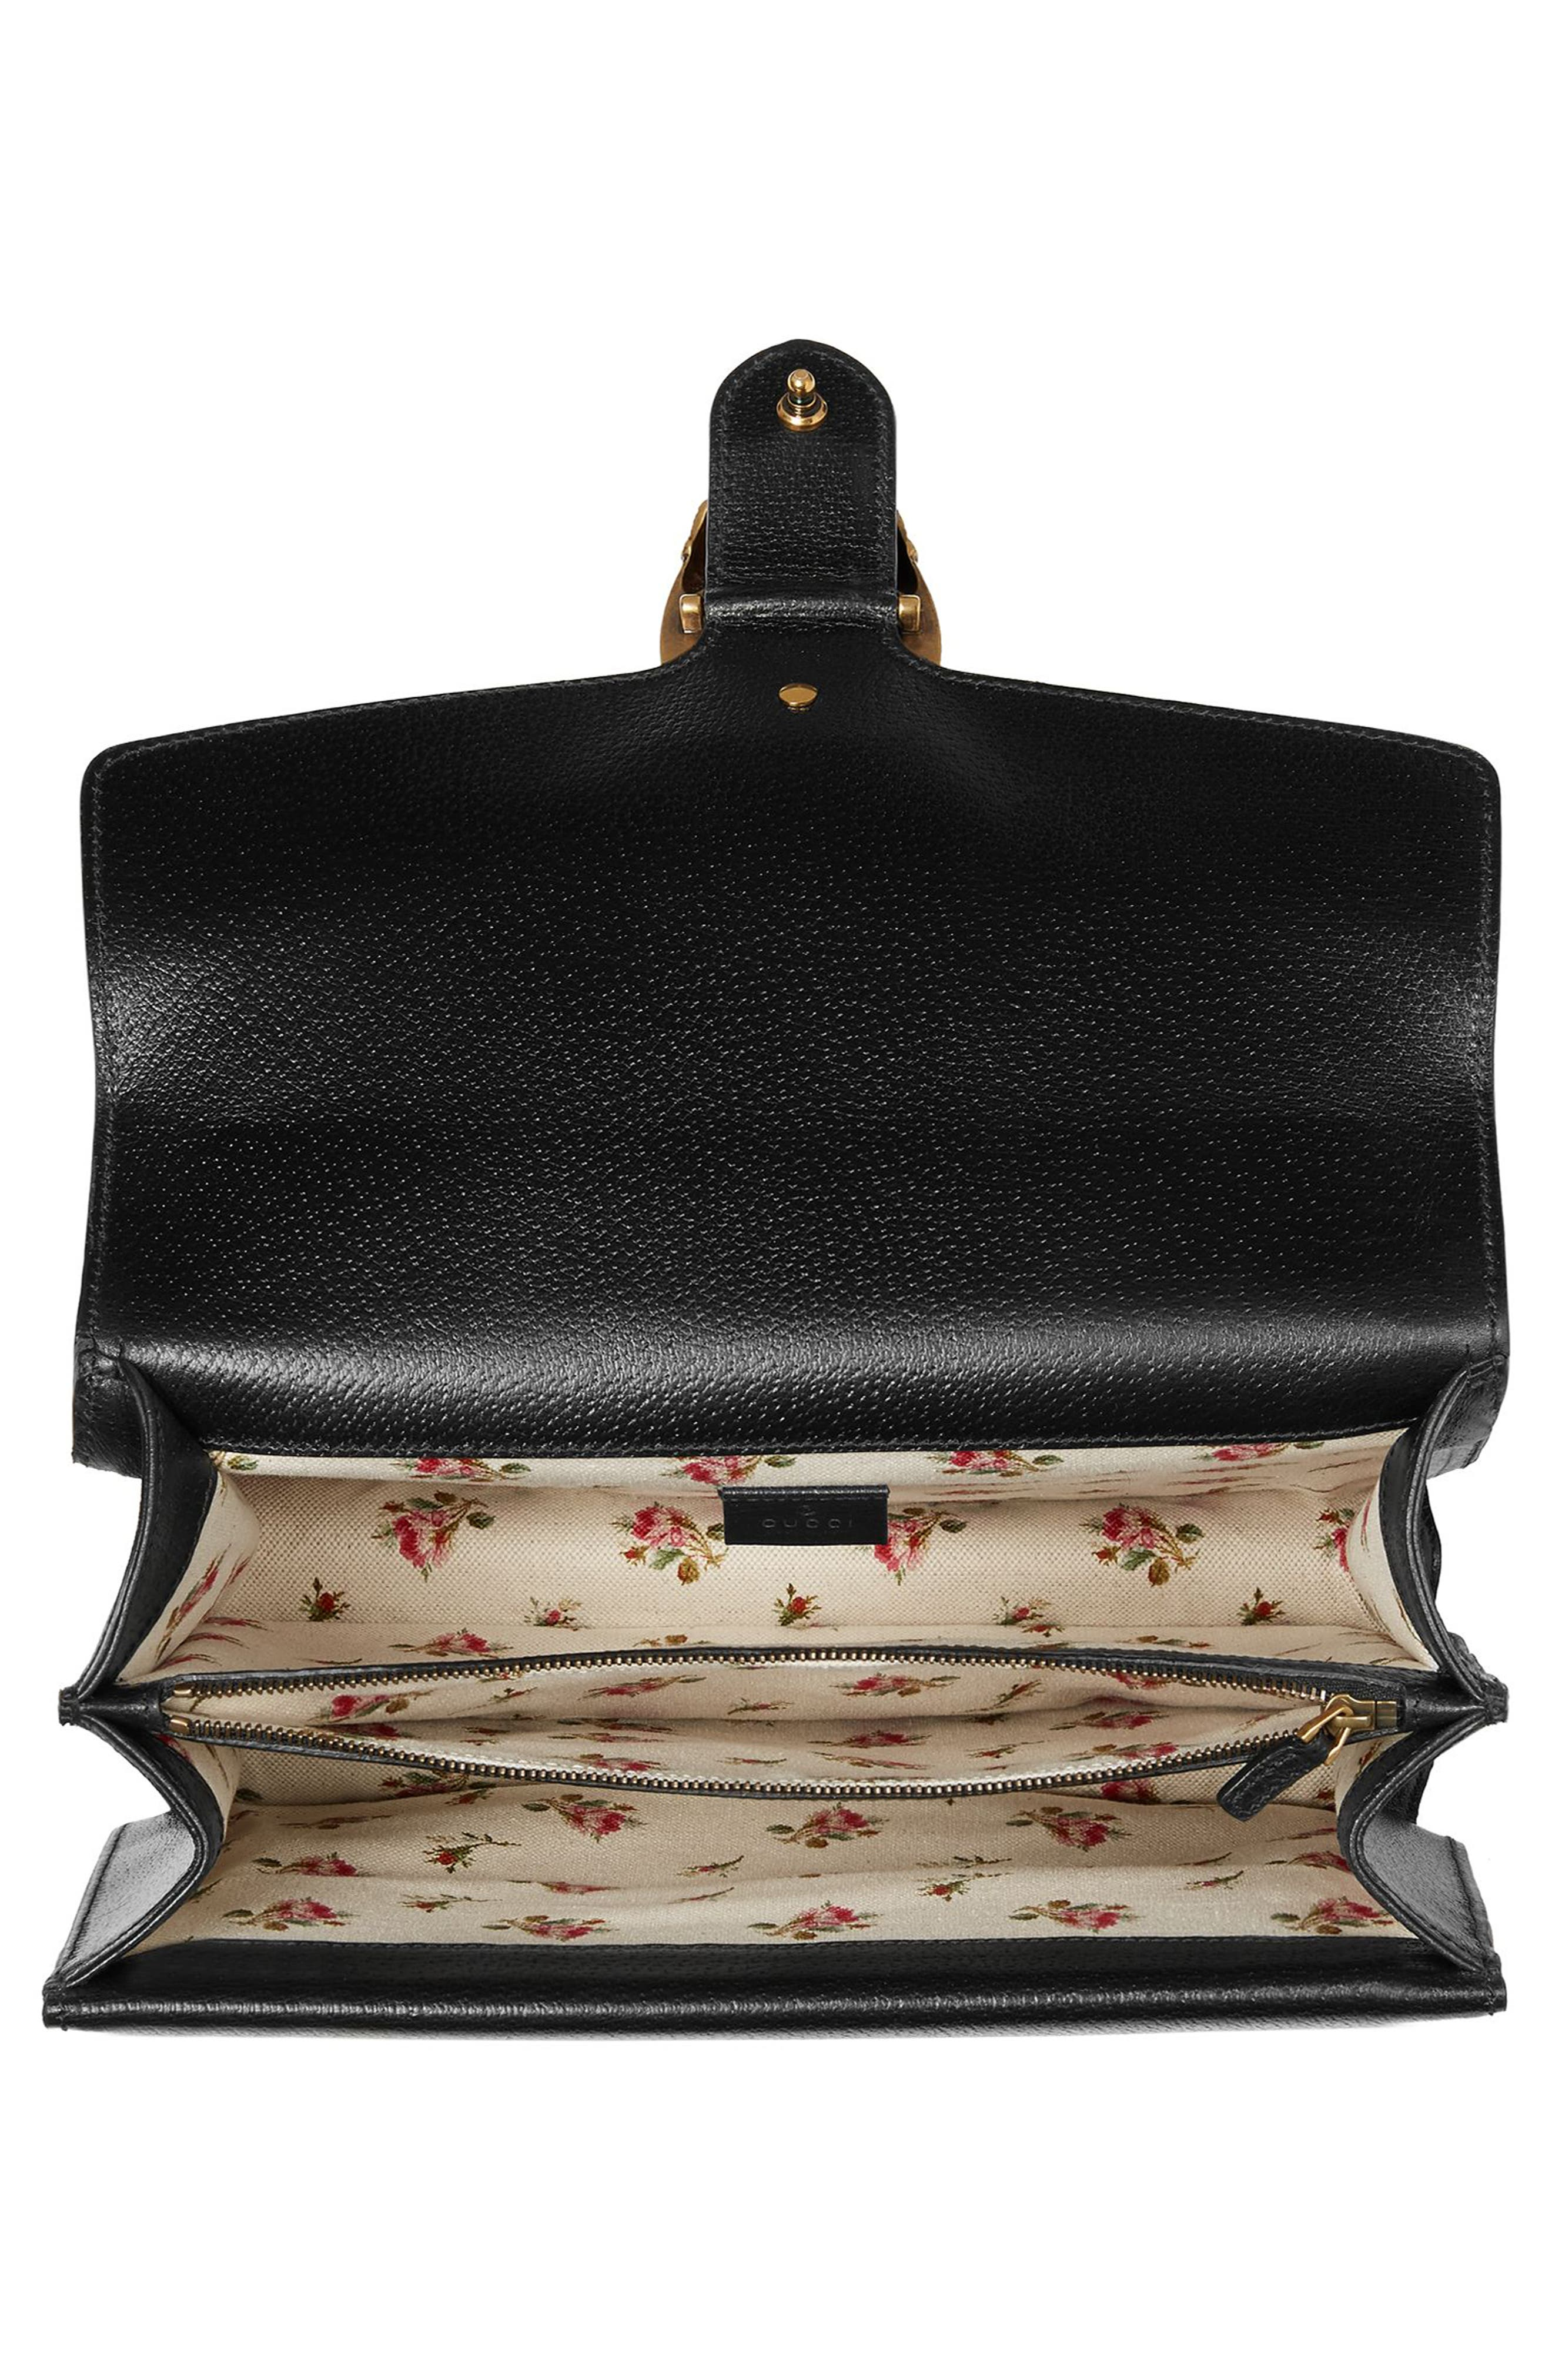 Medium Dionysus Embroidered Roses Leather Shoulder Bag,                             Alternate thumbnail 3, color,                             Nero/Multi